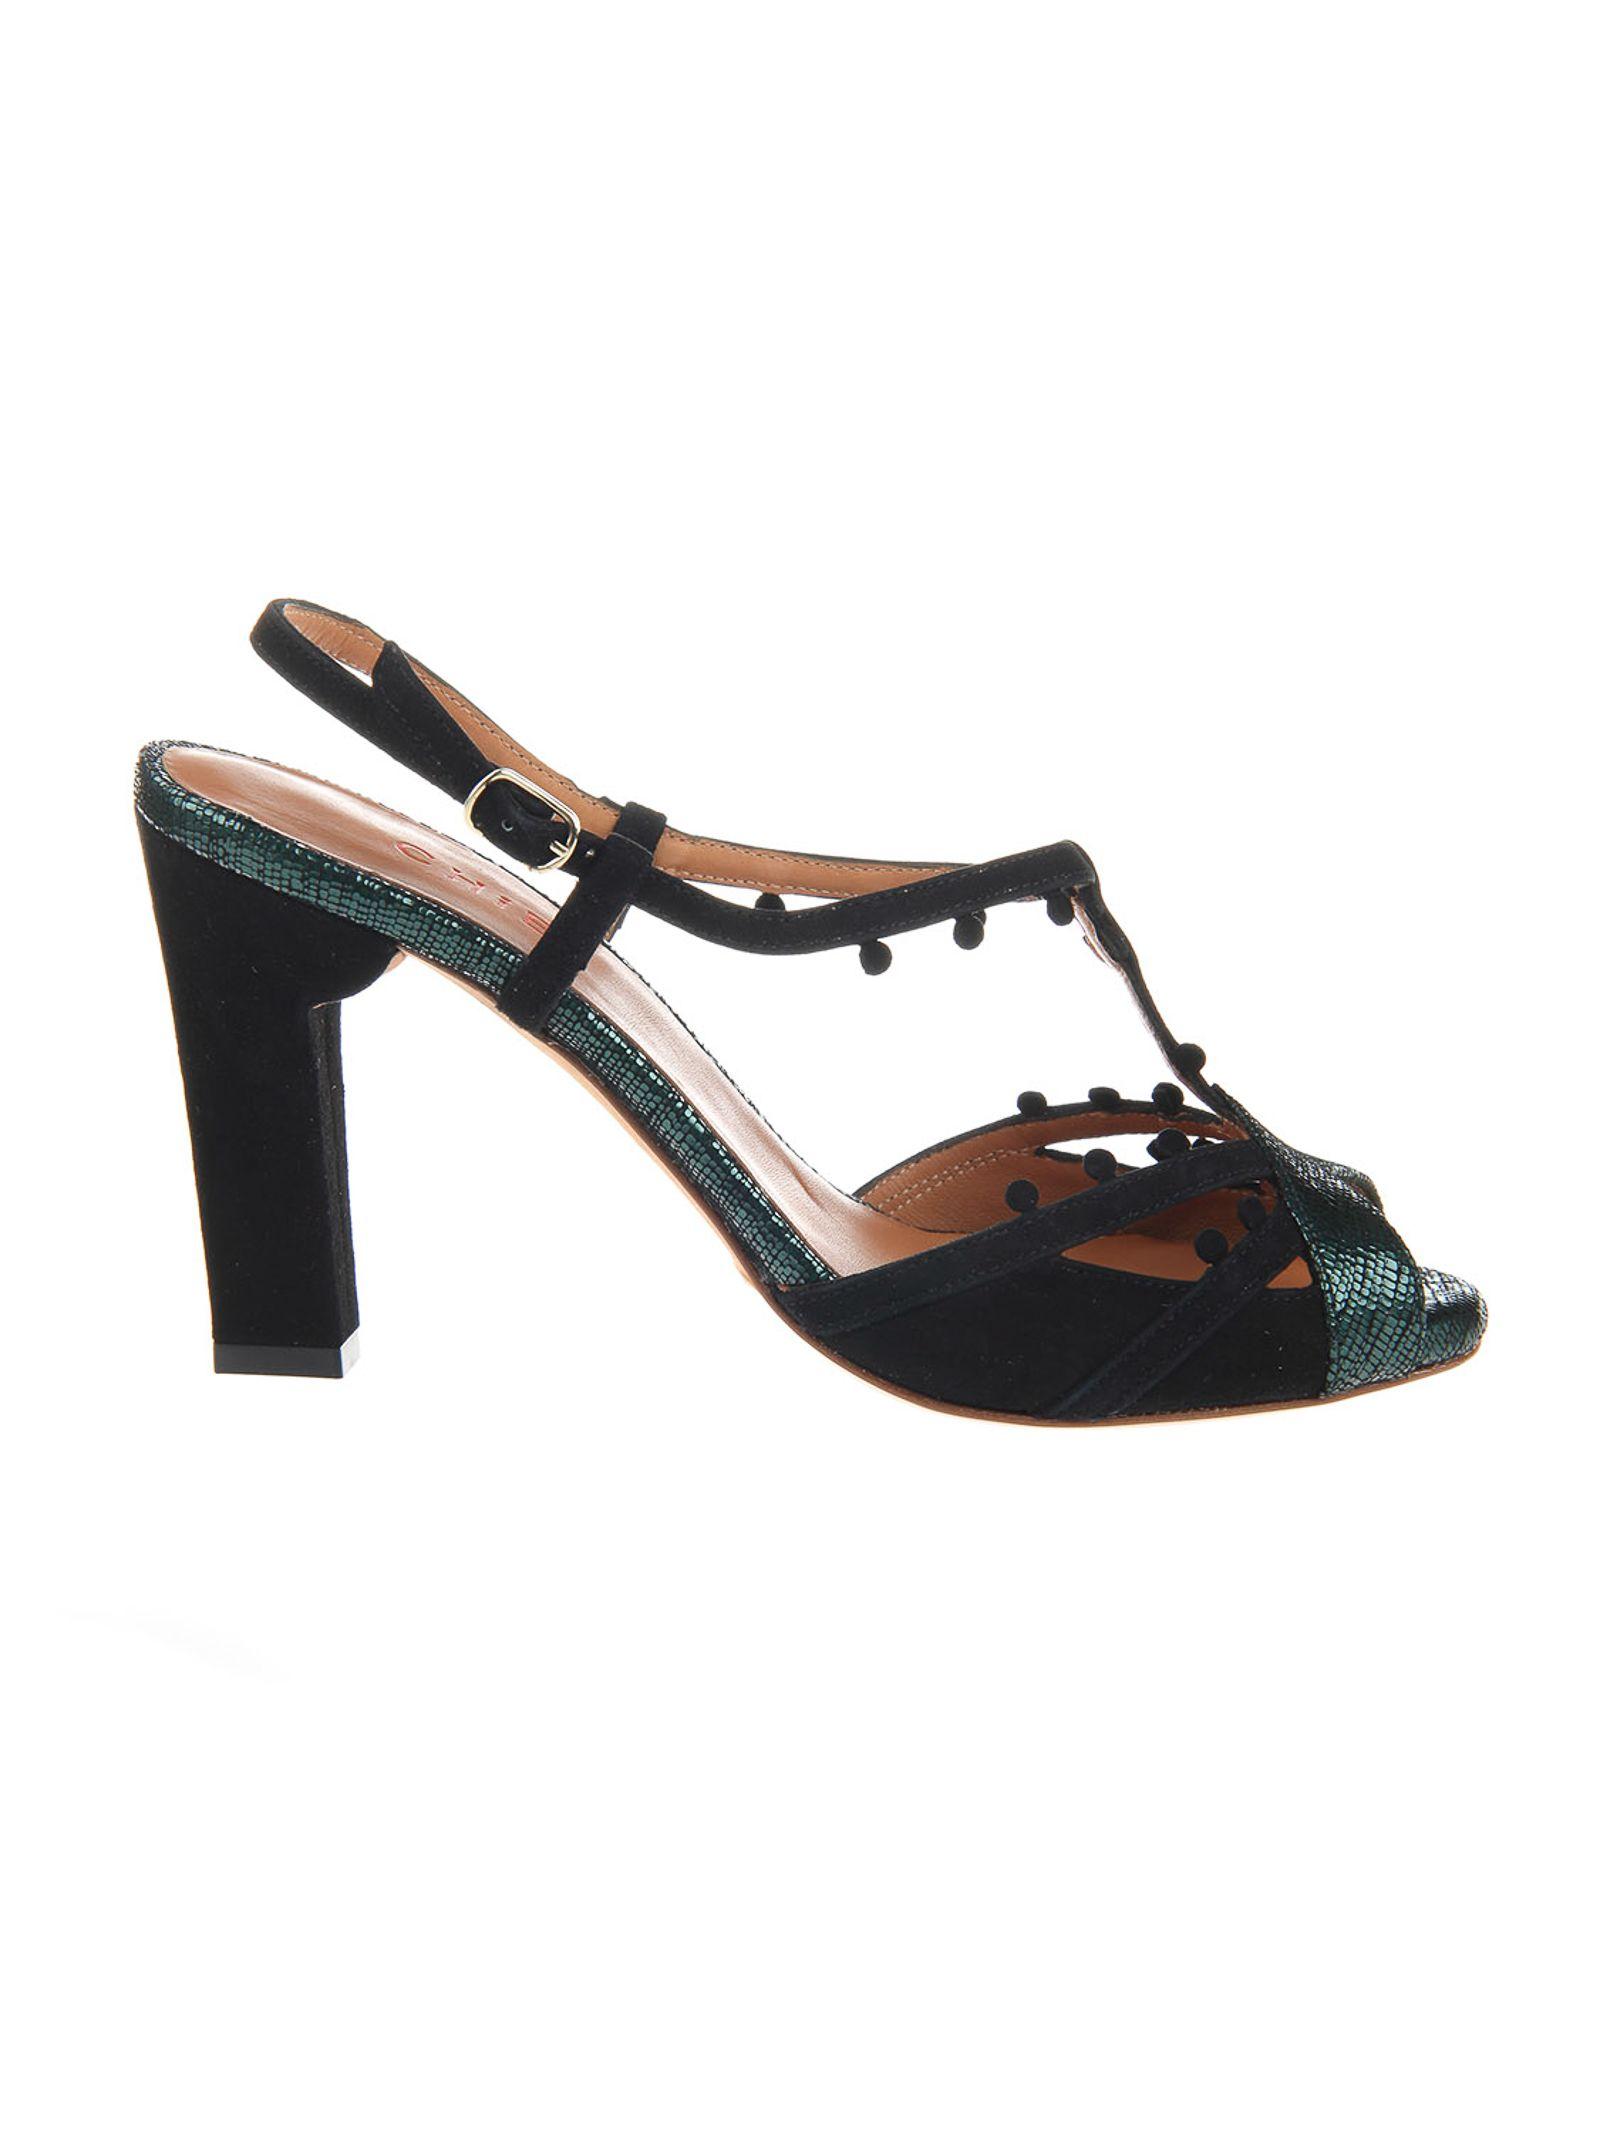 metallic sandals - Black Chie Mihara ExDJChn4